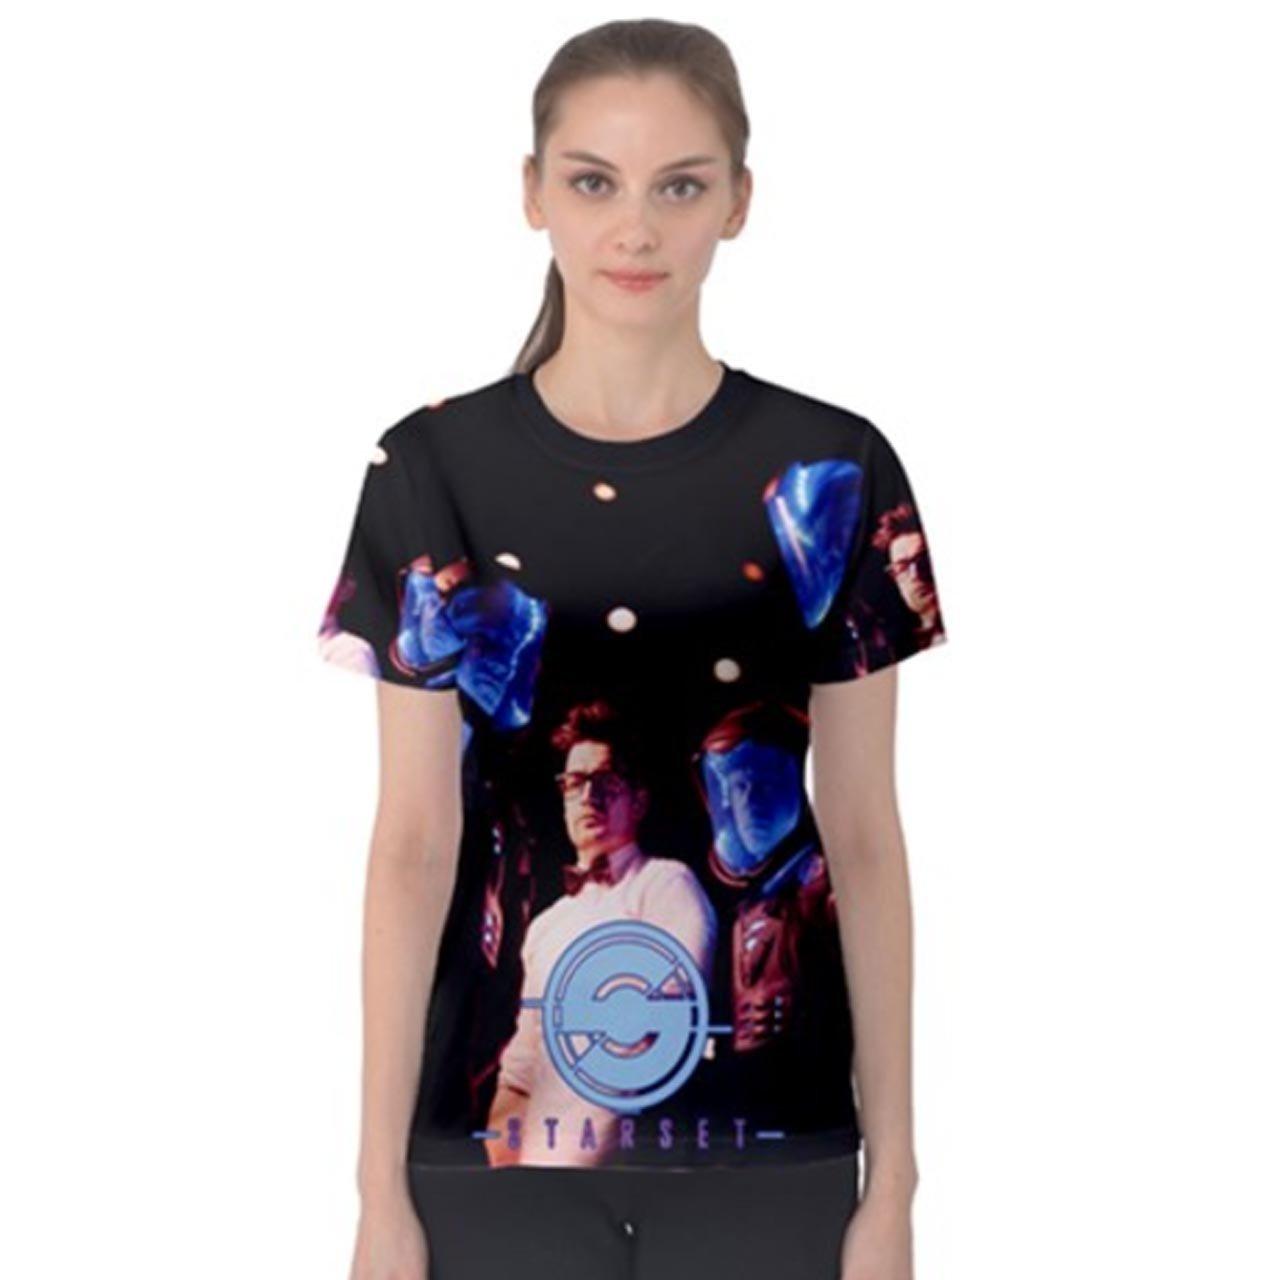 Starset Women 's Tee Fullprint TシャツサイズM   B0753KRMS9